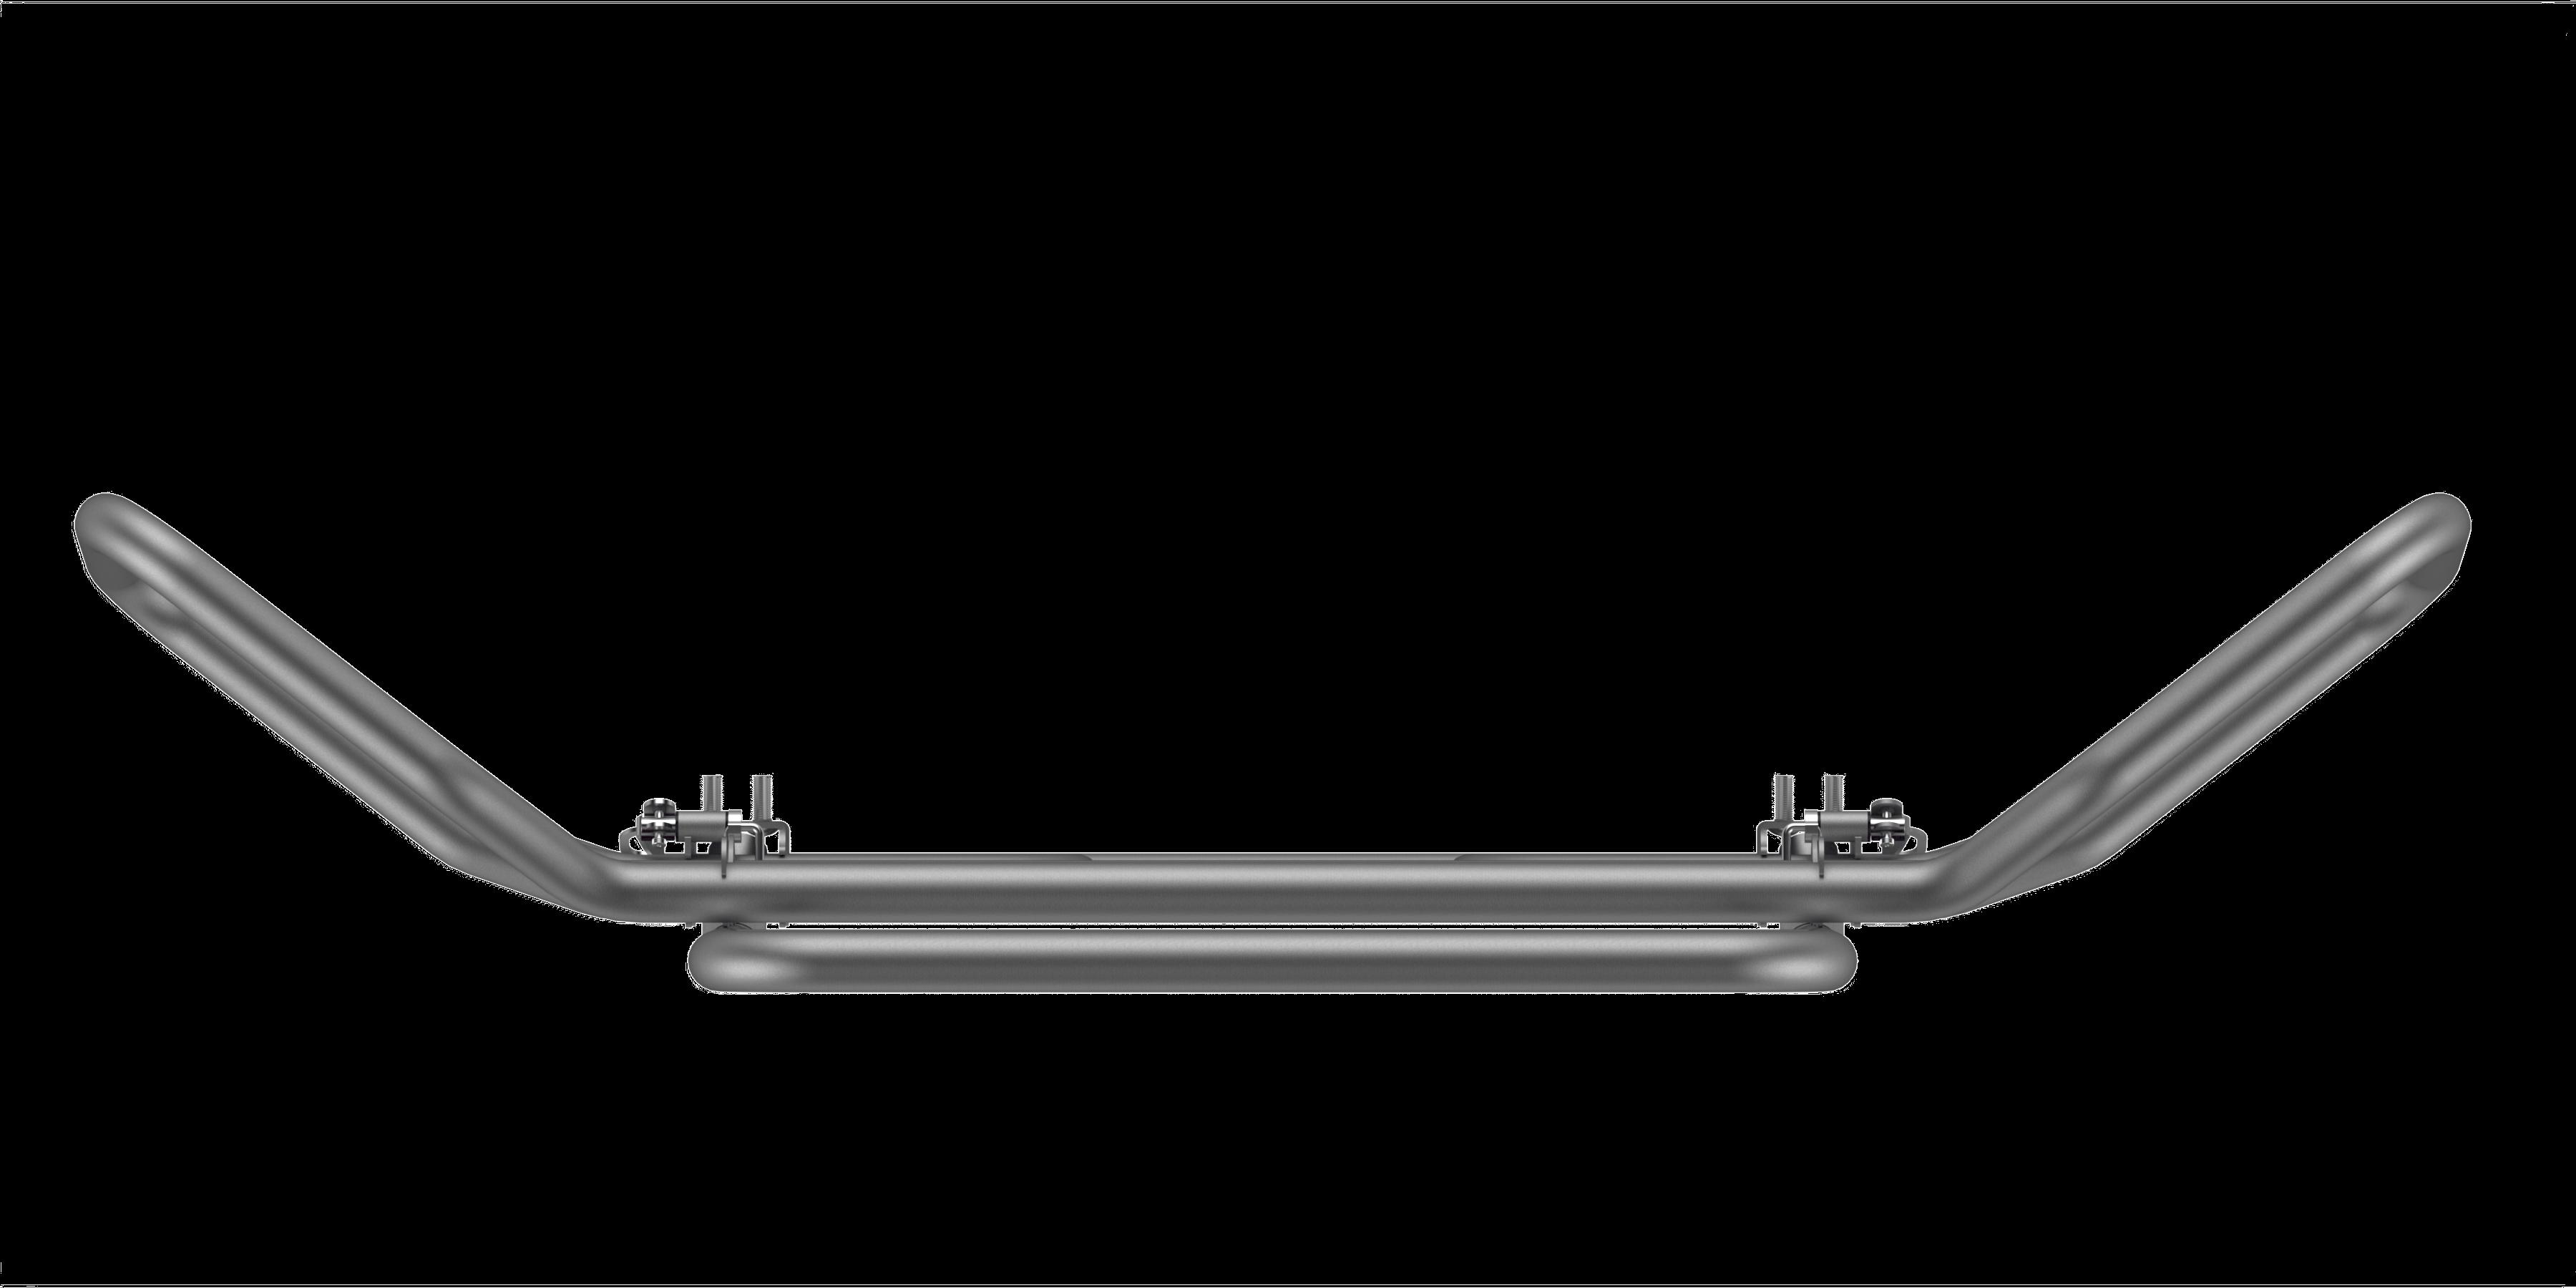 XG-195